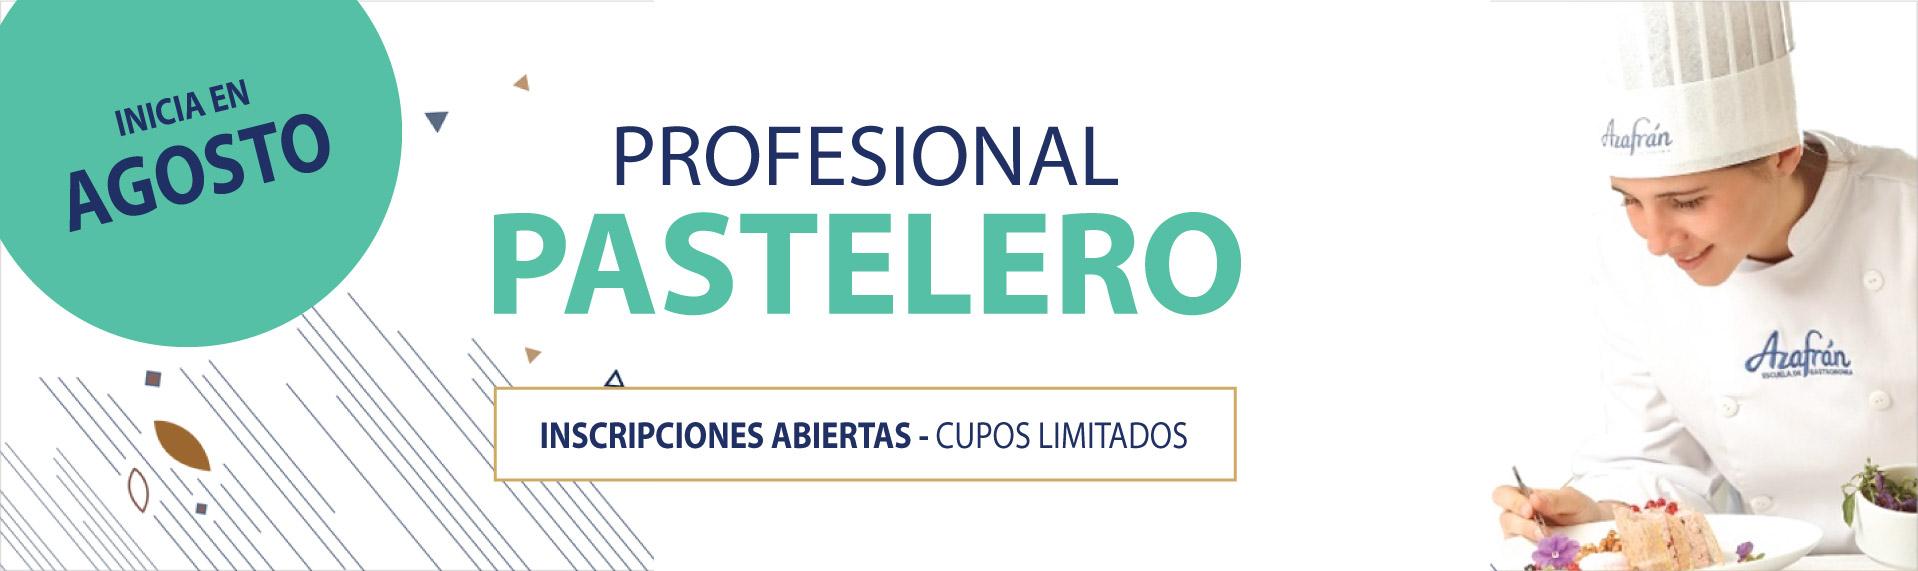 Profesional-Pastelero-Web